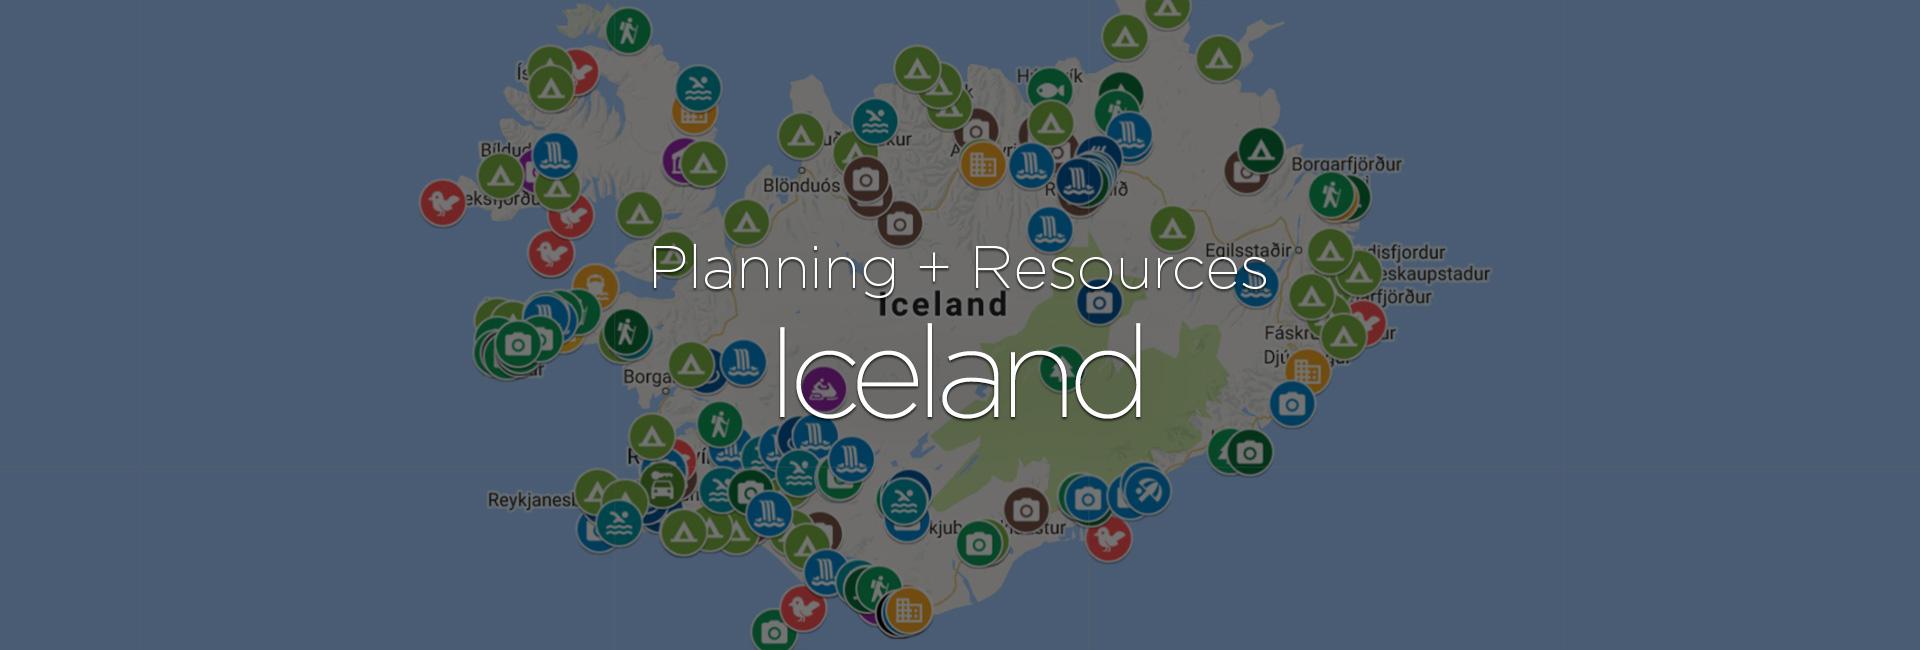 Iceland Trip Planning + Resources